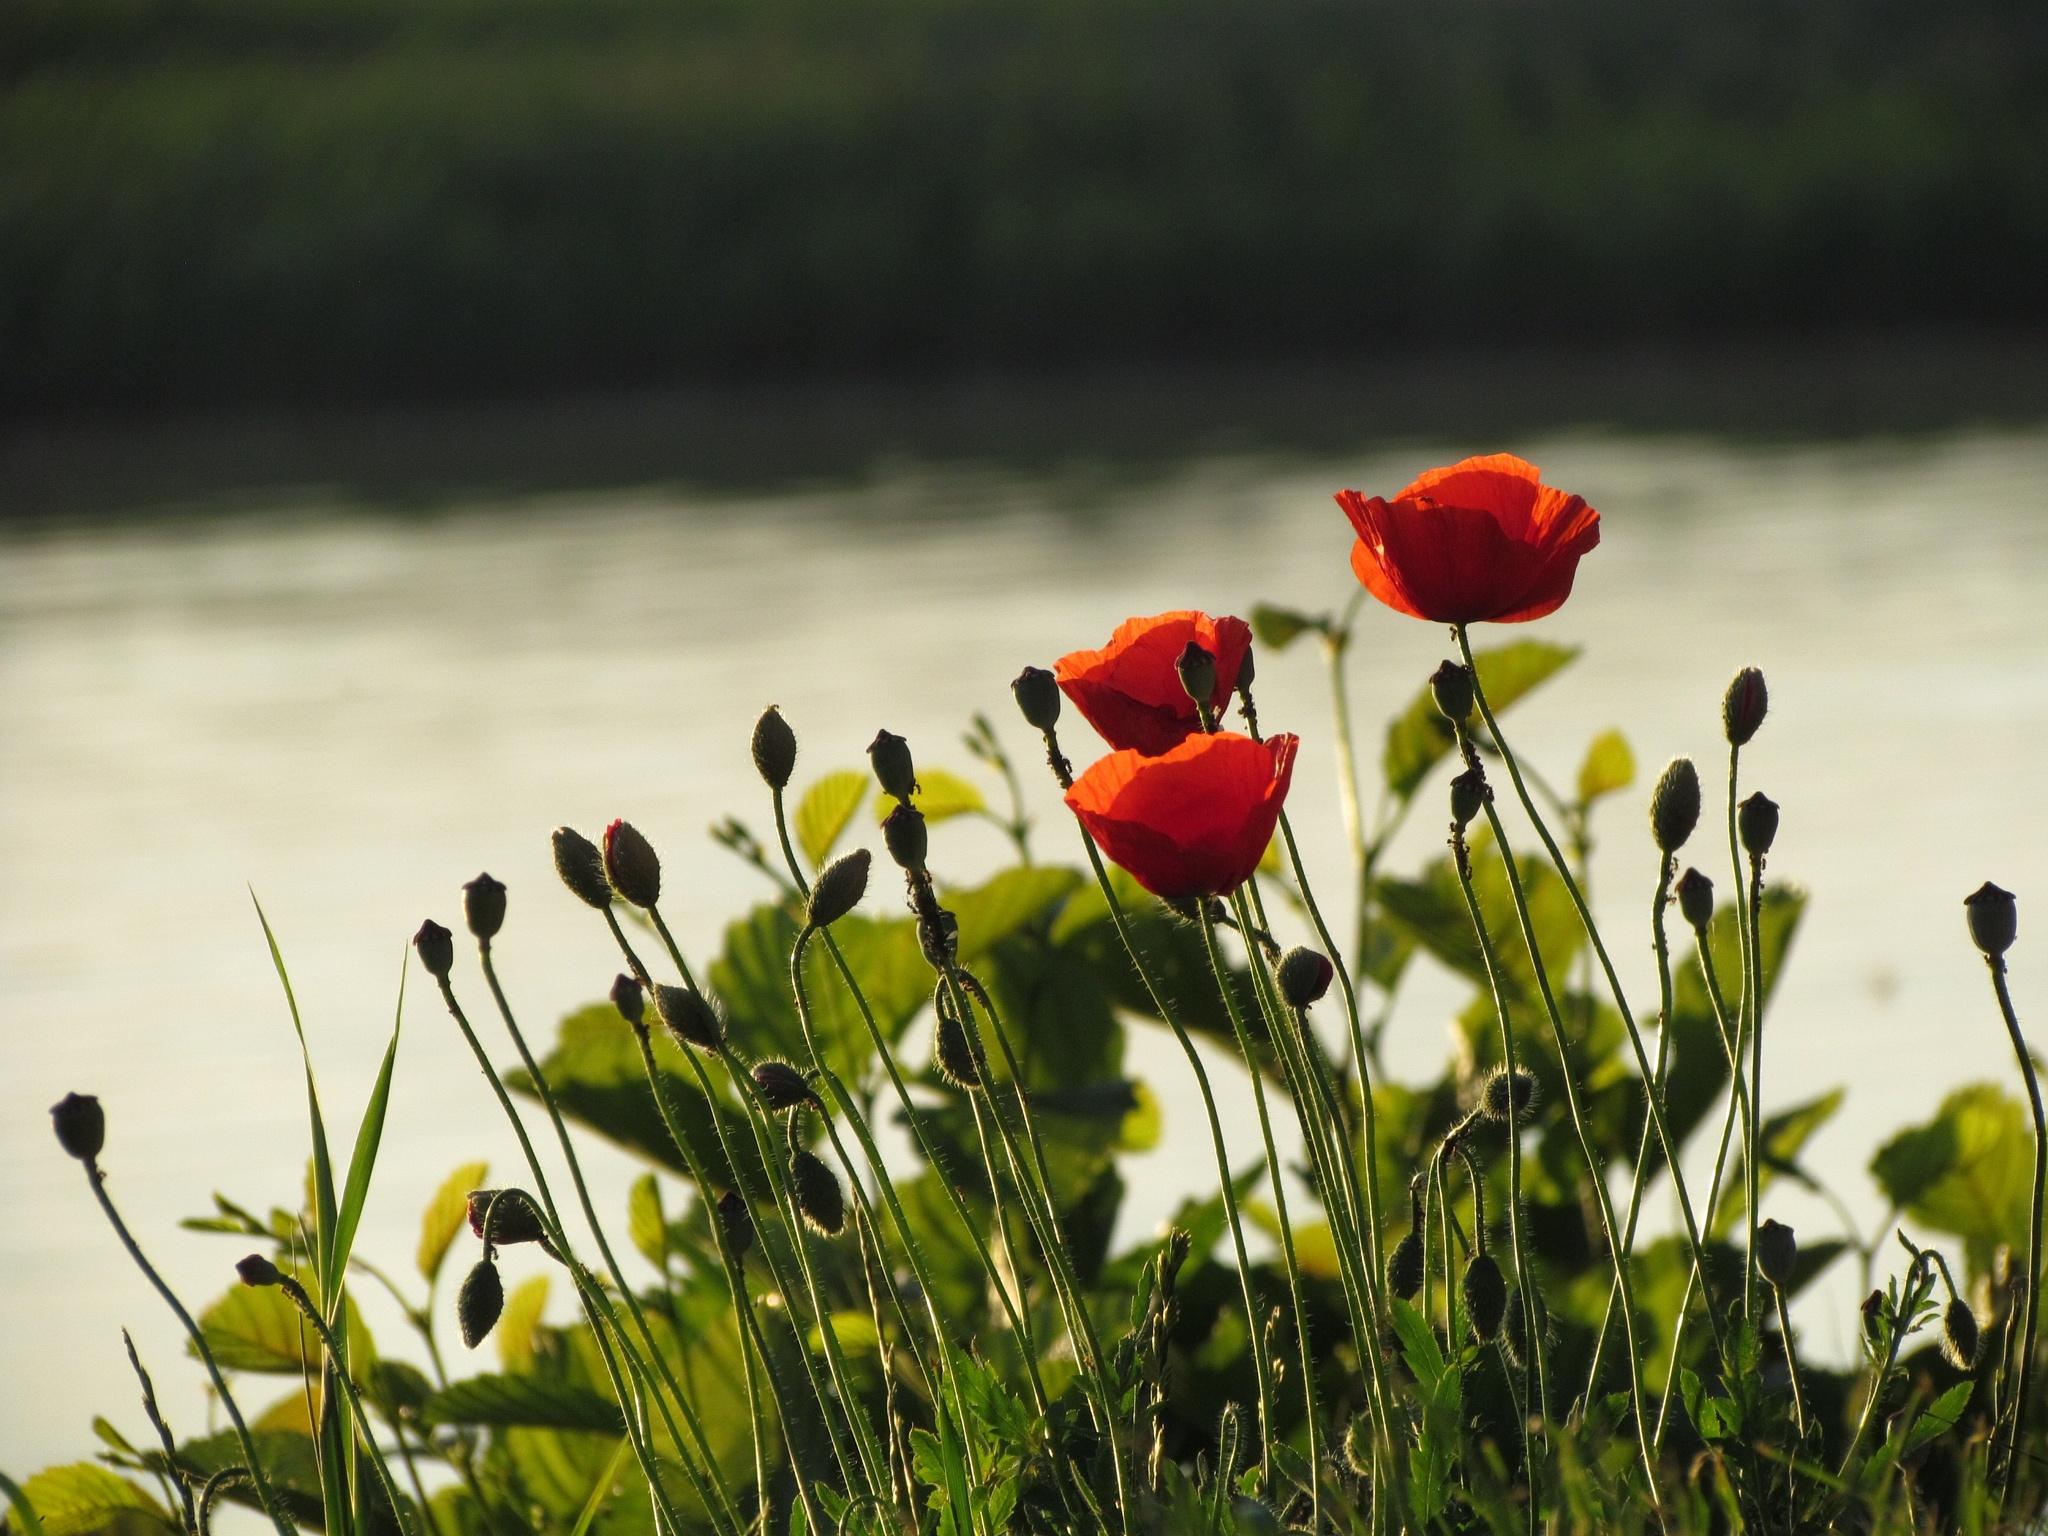 Poppies by marta.figurzynskaderouiche